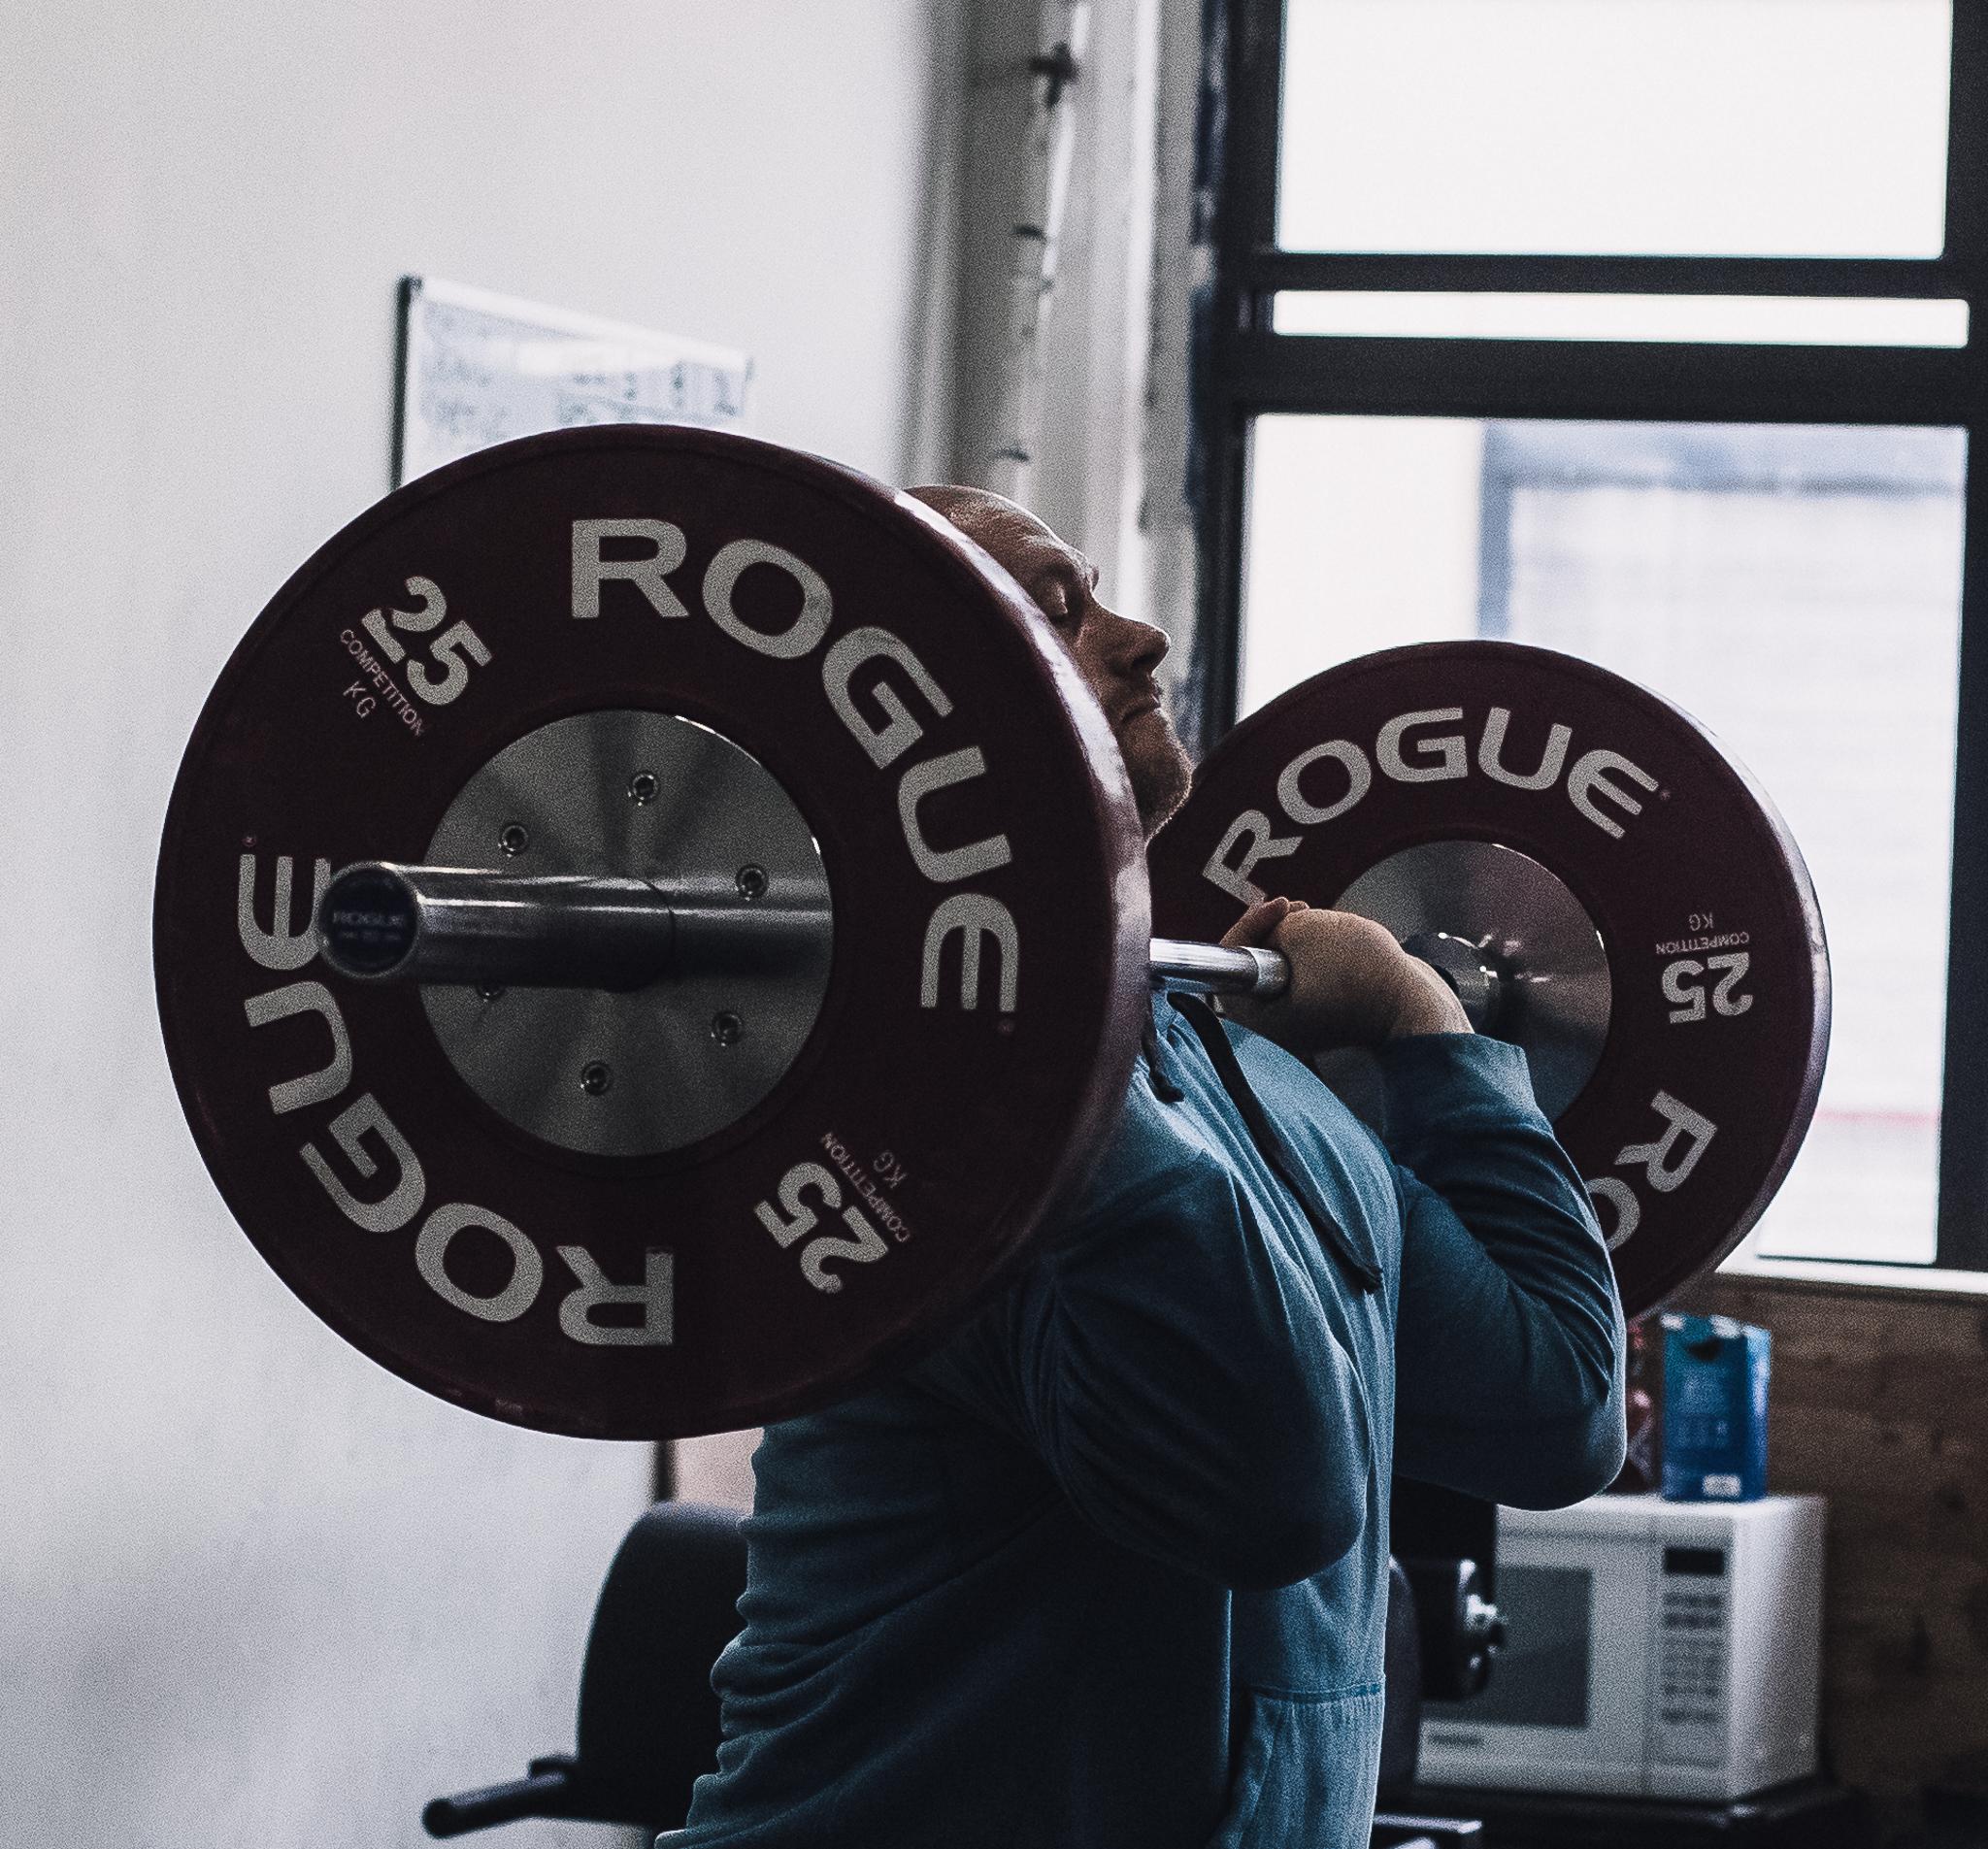 yasha-kahn-weightlifting-coach-16.jpg